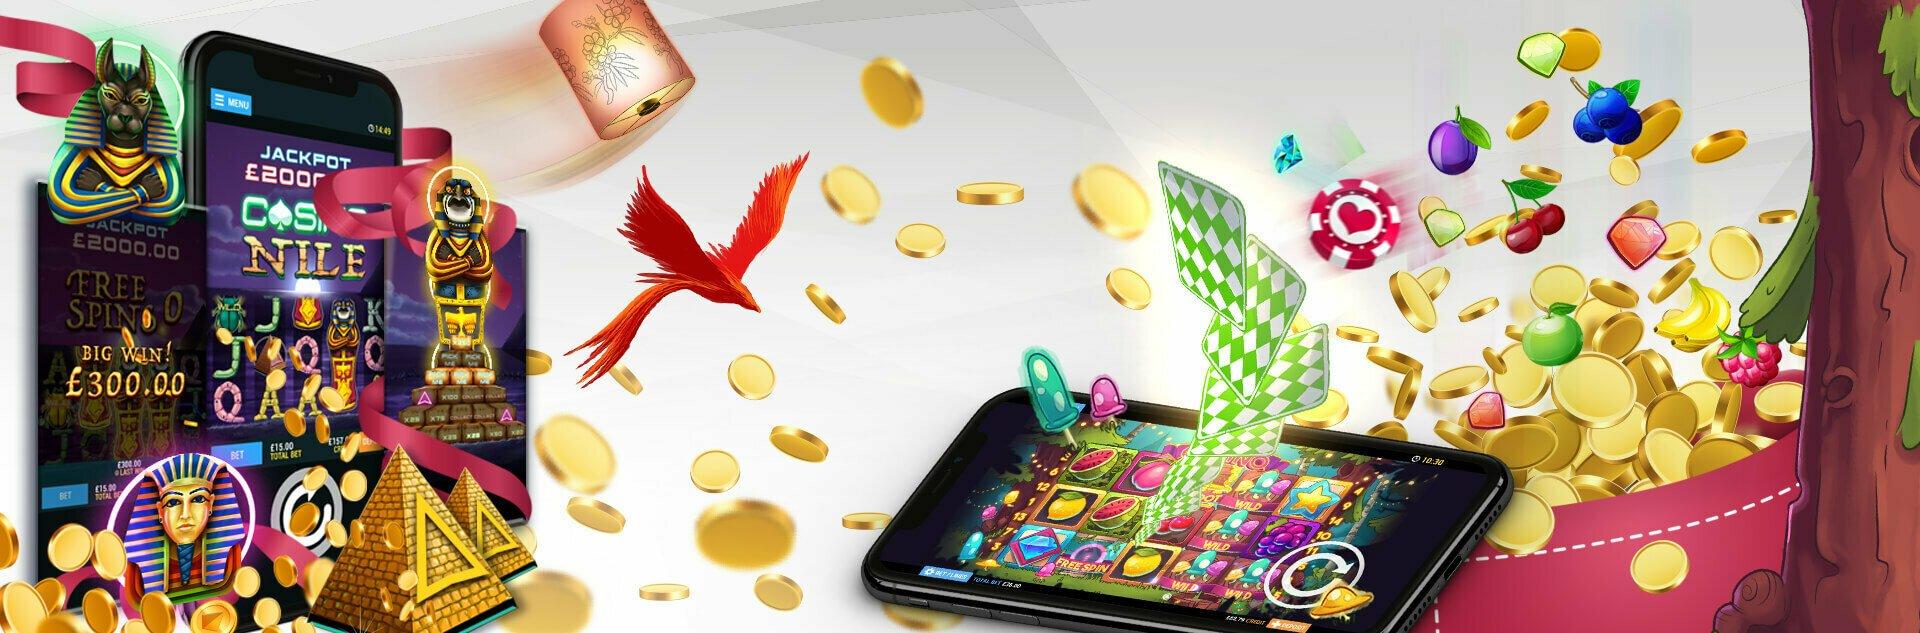 PocketWin casino review UK